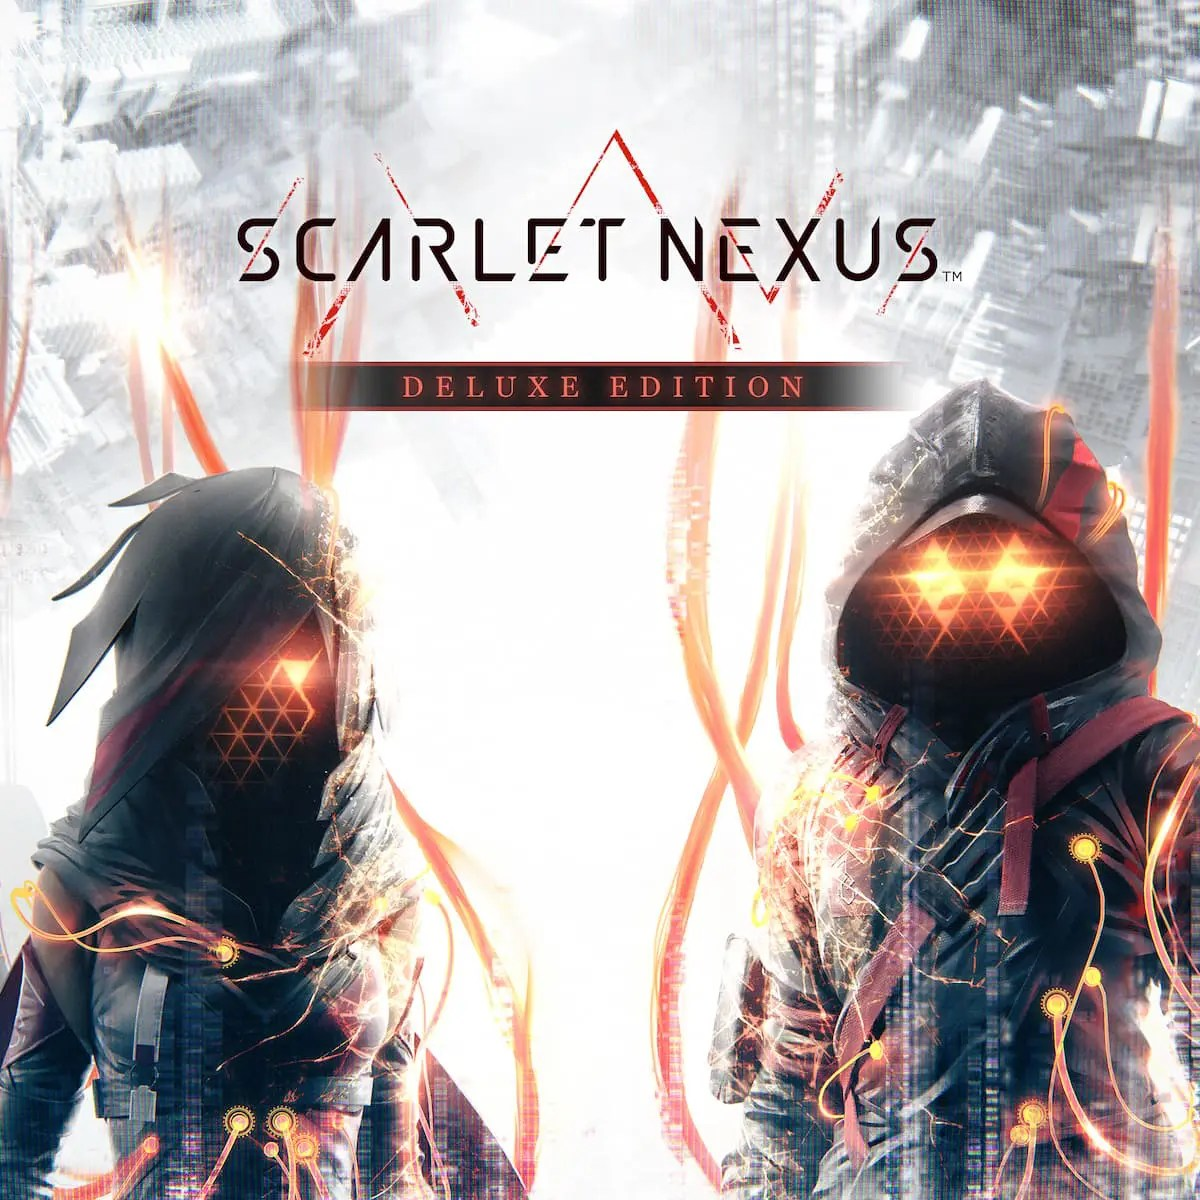 SCARLET NEXUS -DELUXE EDITION-